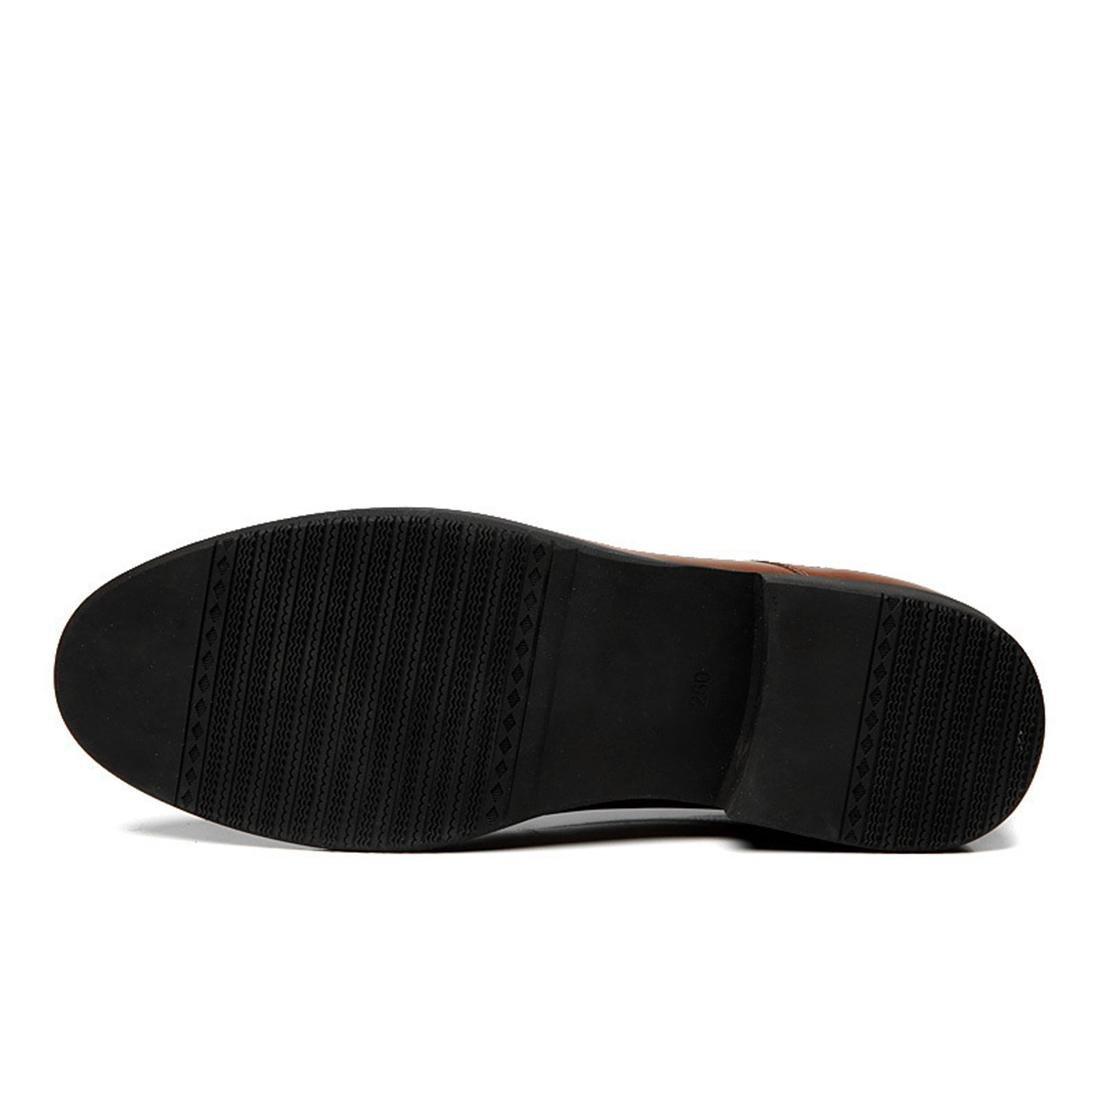 Herren Geschäft Formelle Kleidung Lederschuhe Flache Schuhe Schuhe Schuhe Werkzeugschuhe Schuhe erhöhen Rutschfest Dicker Boden EUR GRÖSSE 38-44 9ebe4f